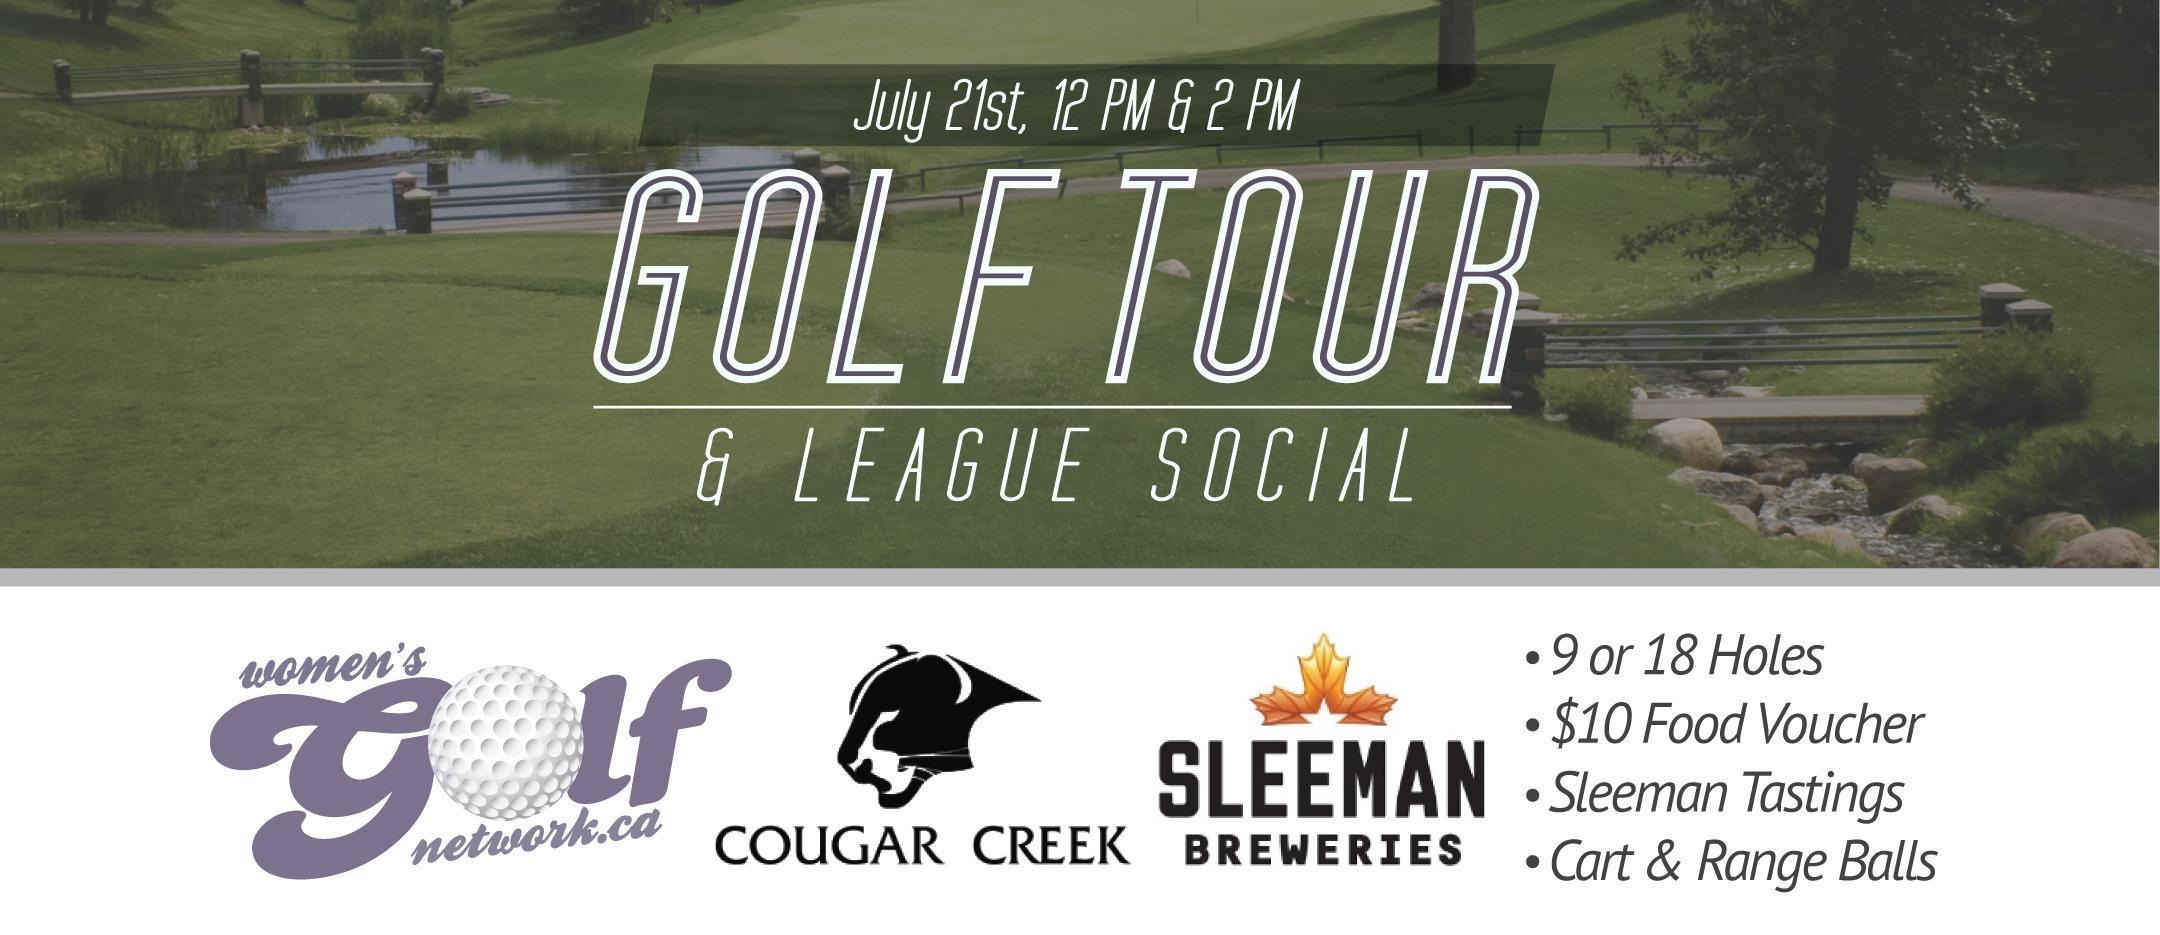 Cougar Creek Golf Tour - Edmonton Women's Golf